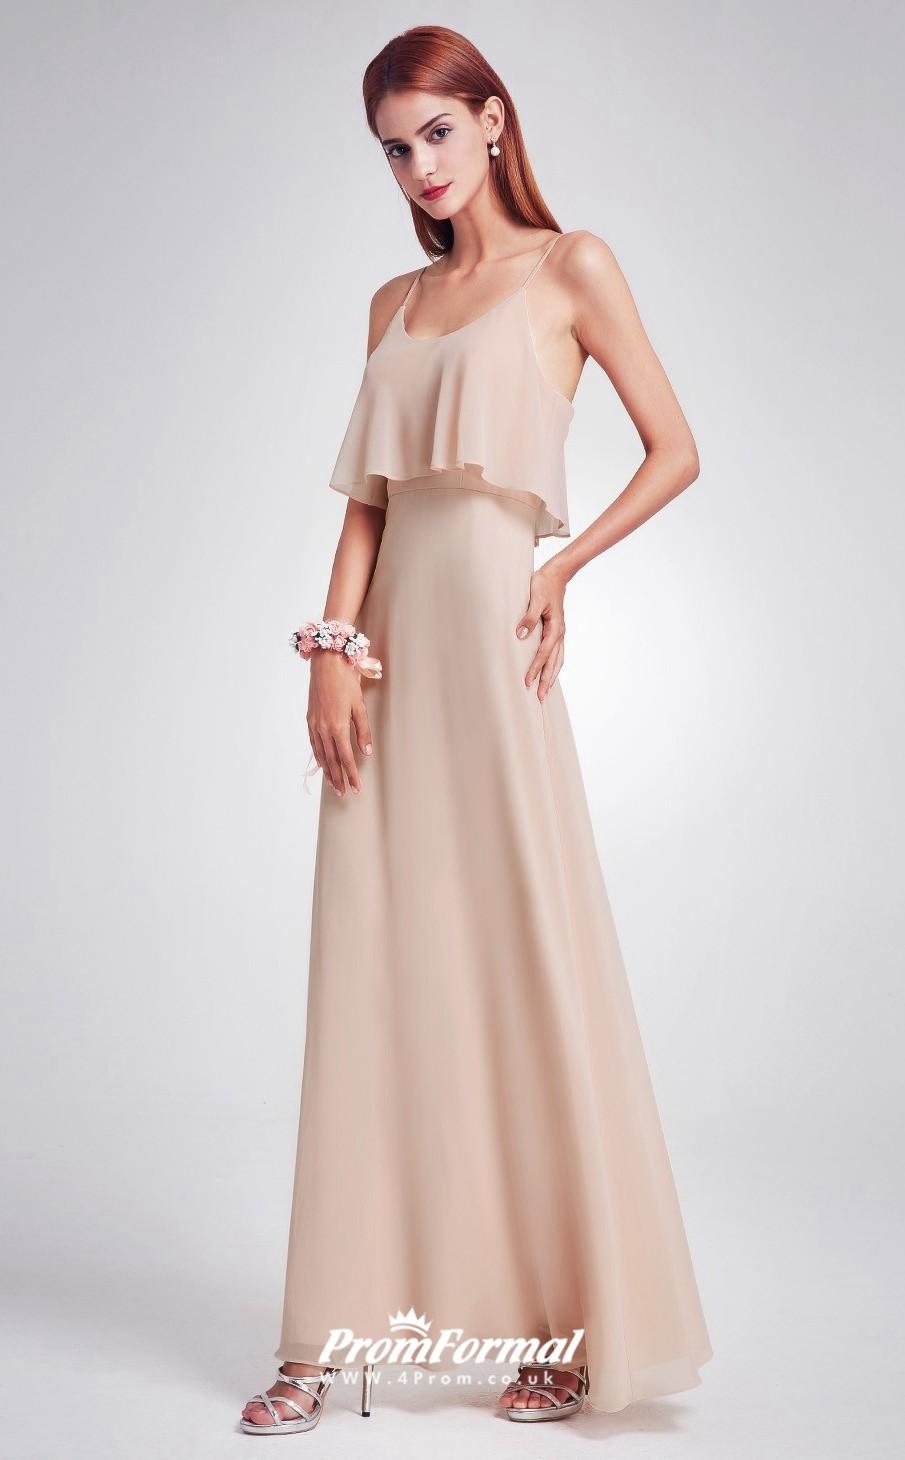 78eff7d7a4 Champagne Bridesmaid Dresses Macys - Gomes Weine AG